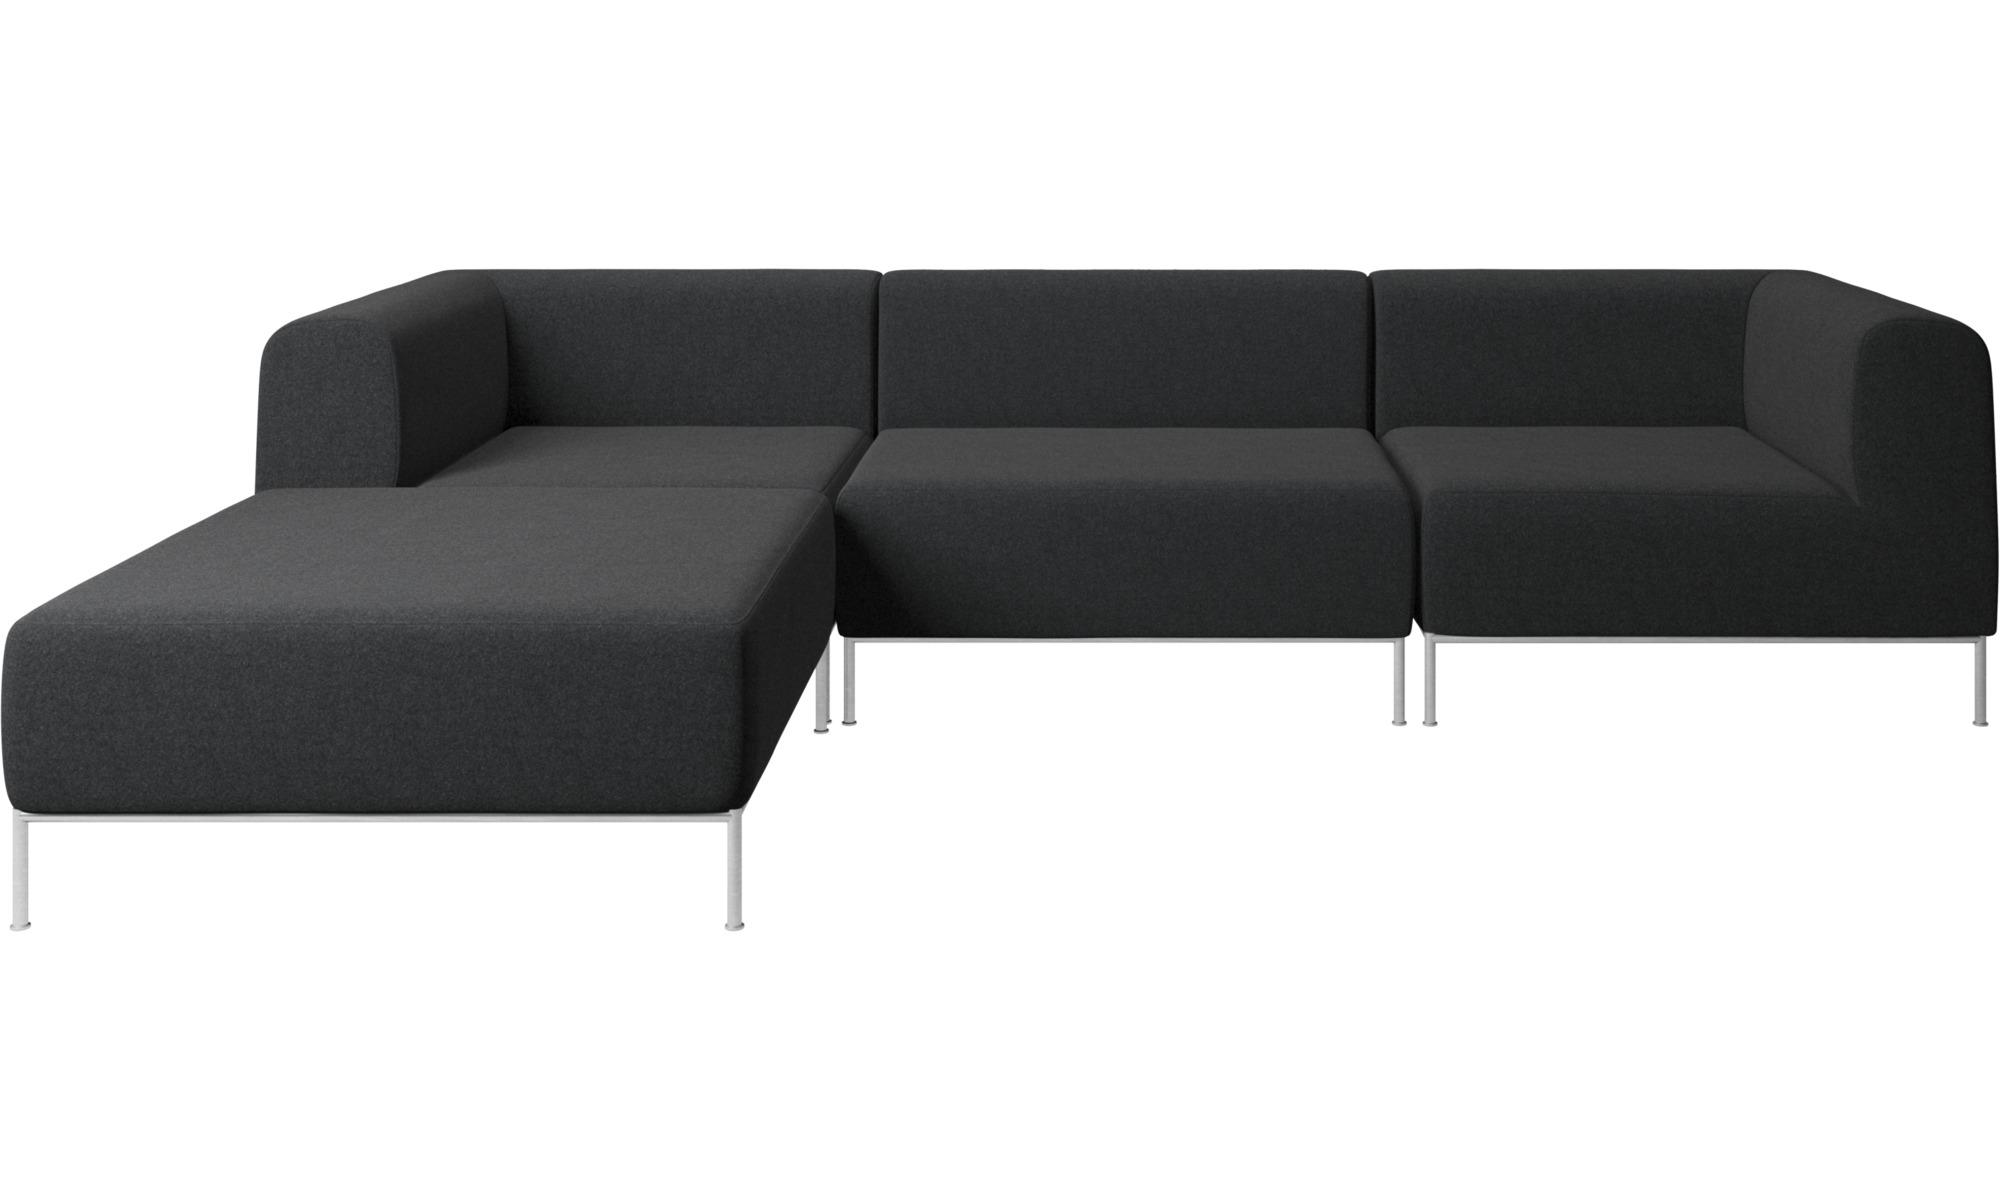 Modular Sofas Miami Corner Sofa With Footstool On Left Side Grey Metal